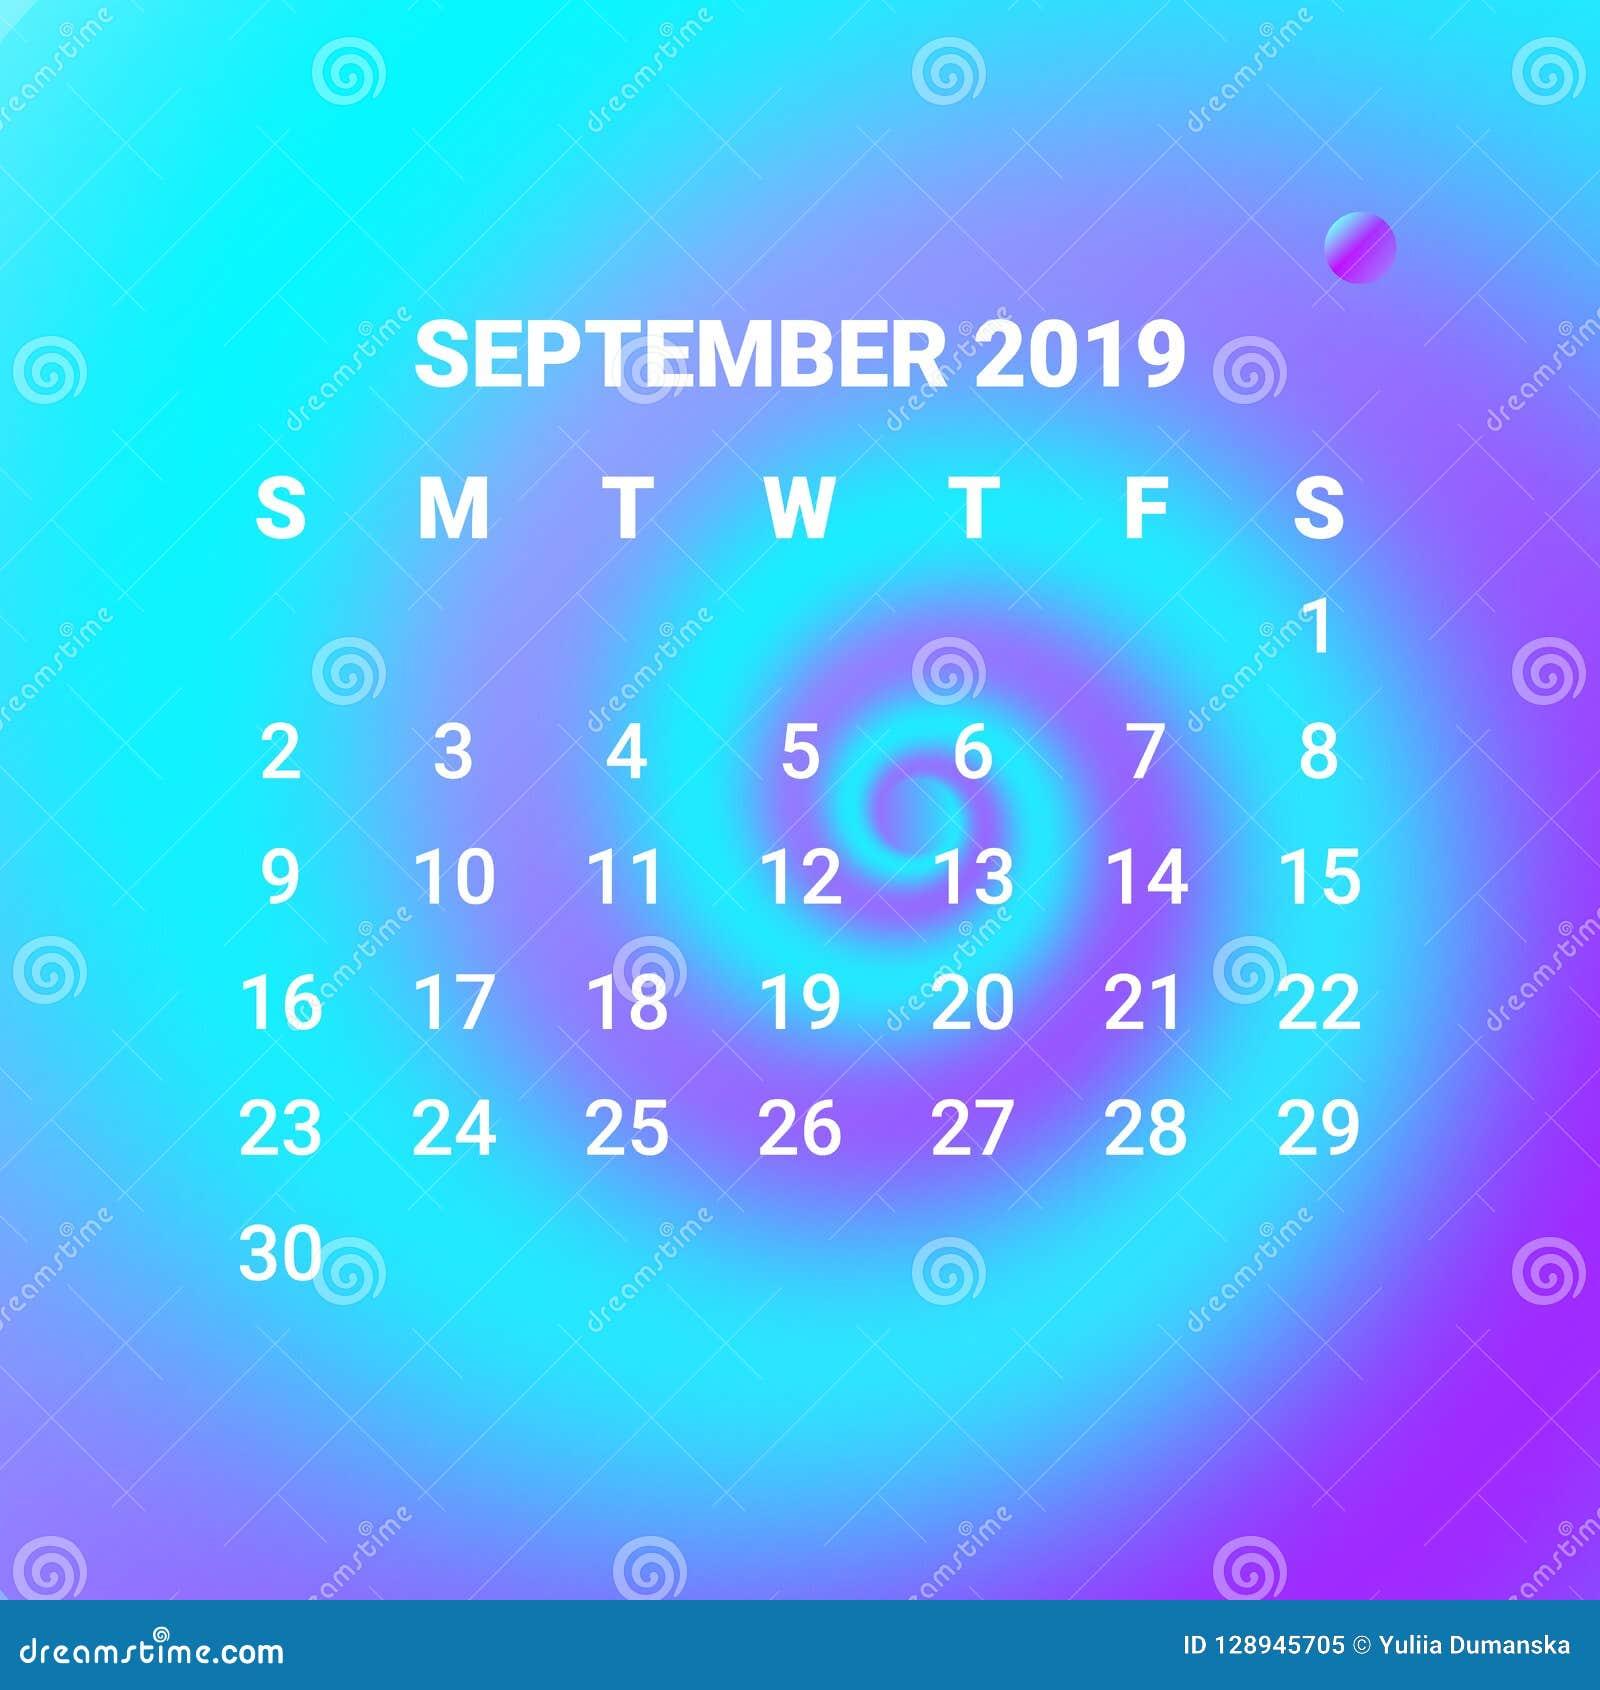 Calendrier Mois De Septembre.3d Calendrier Liquide Colore Liquide 2019 Conception De L